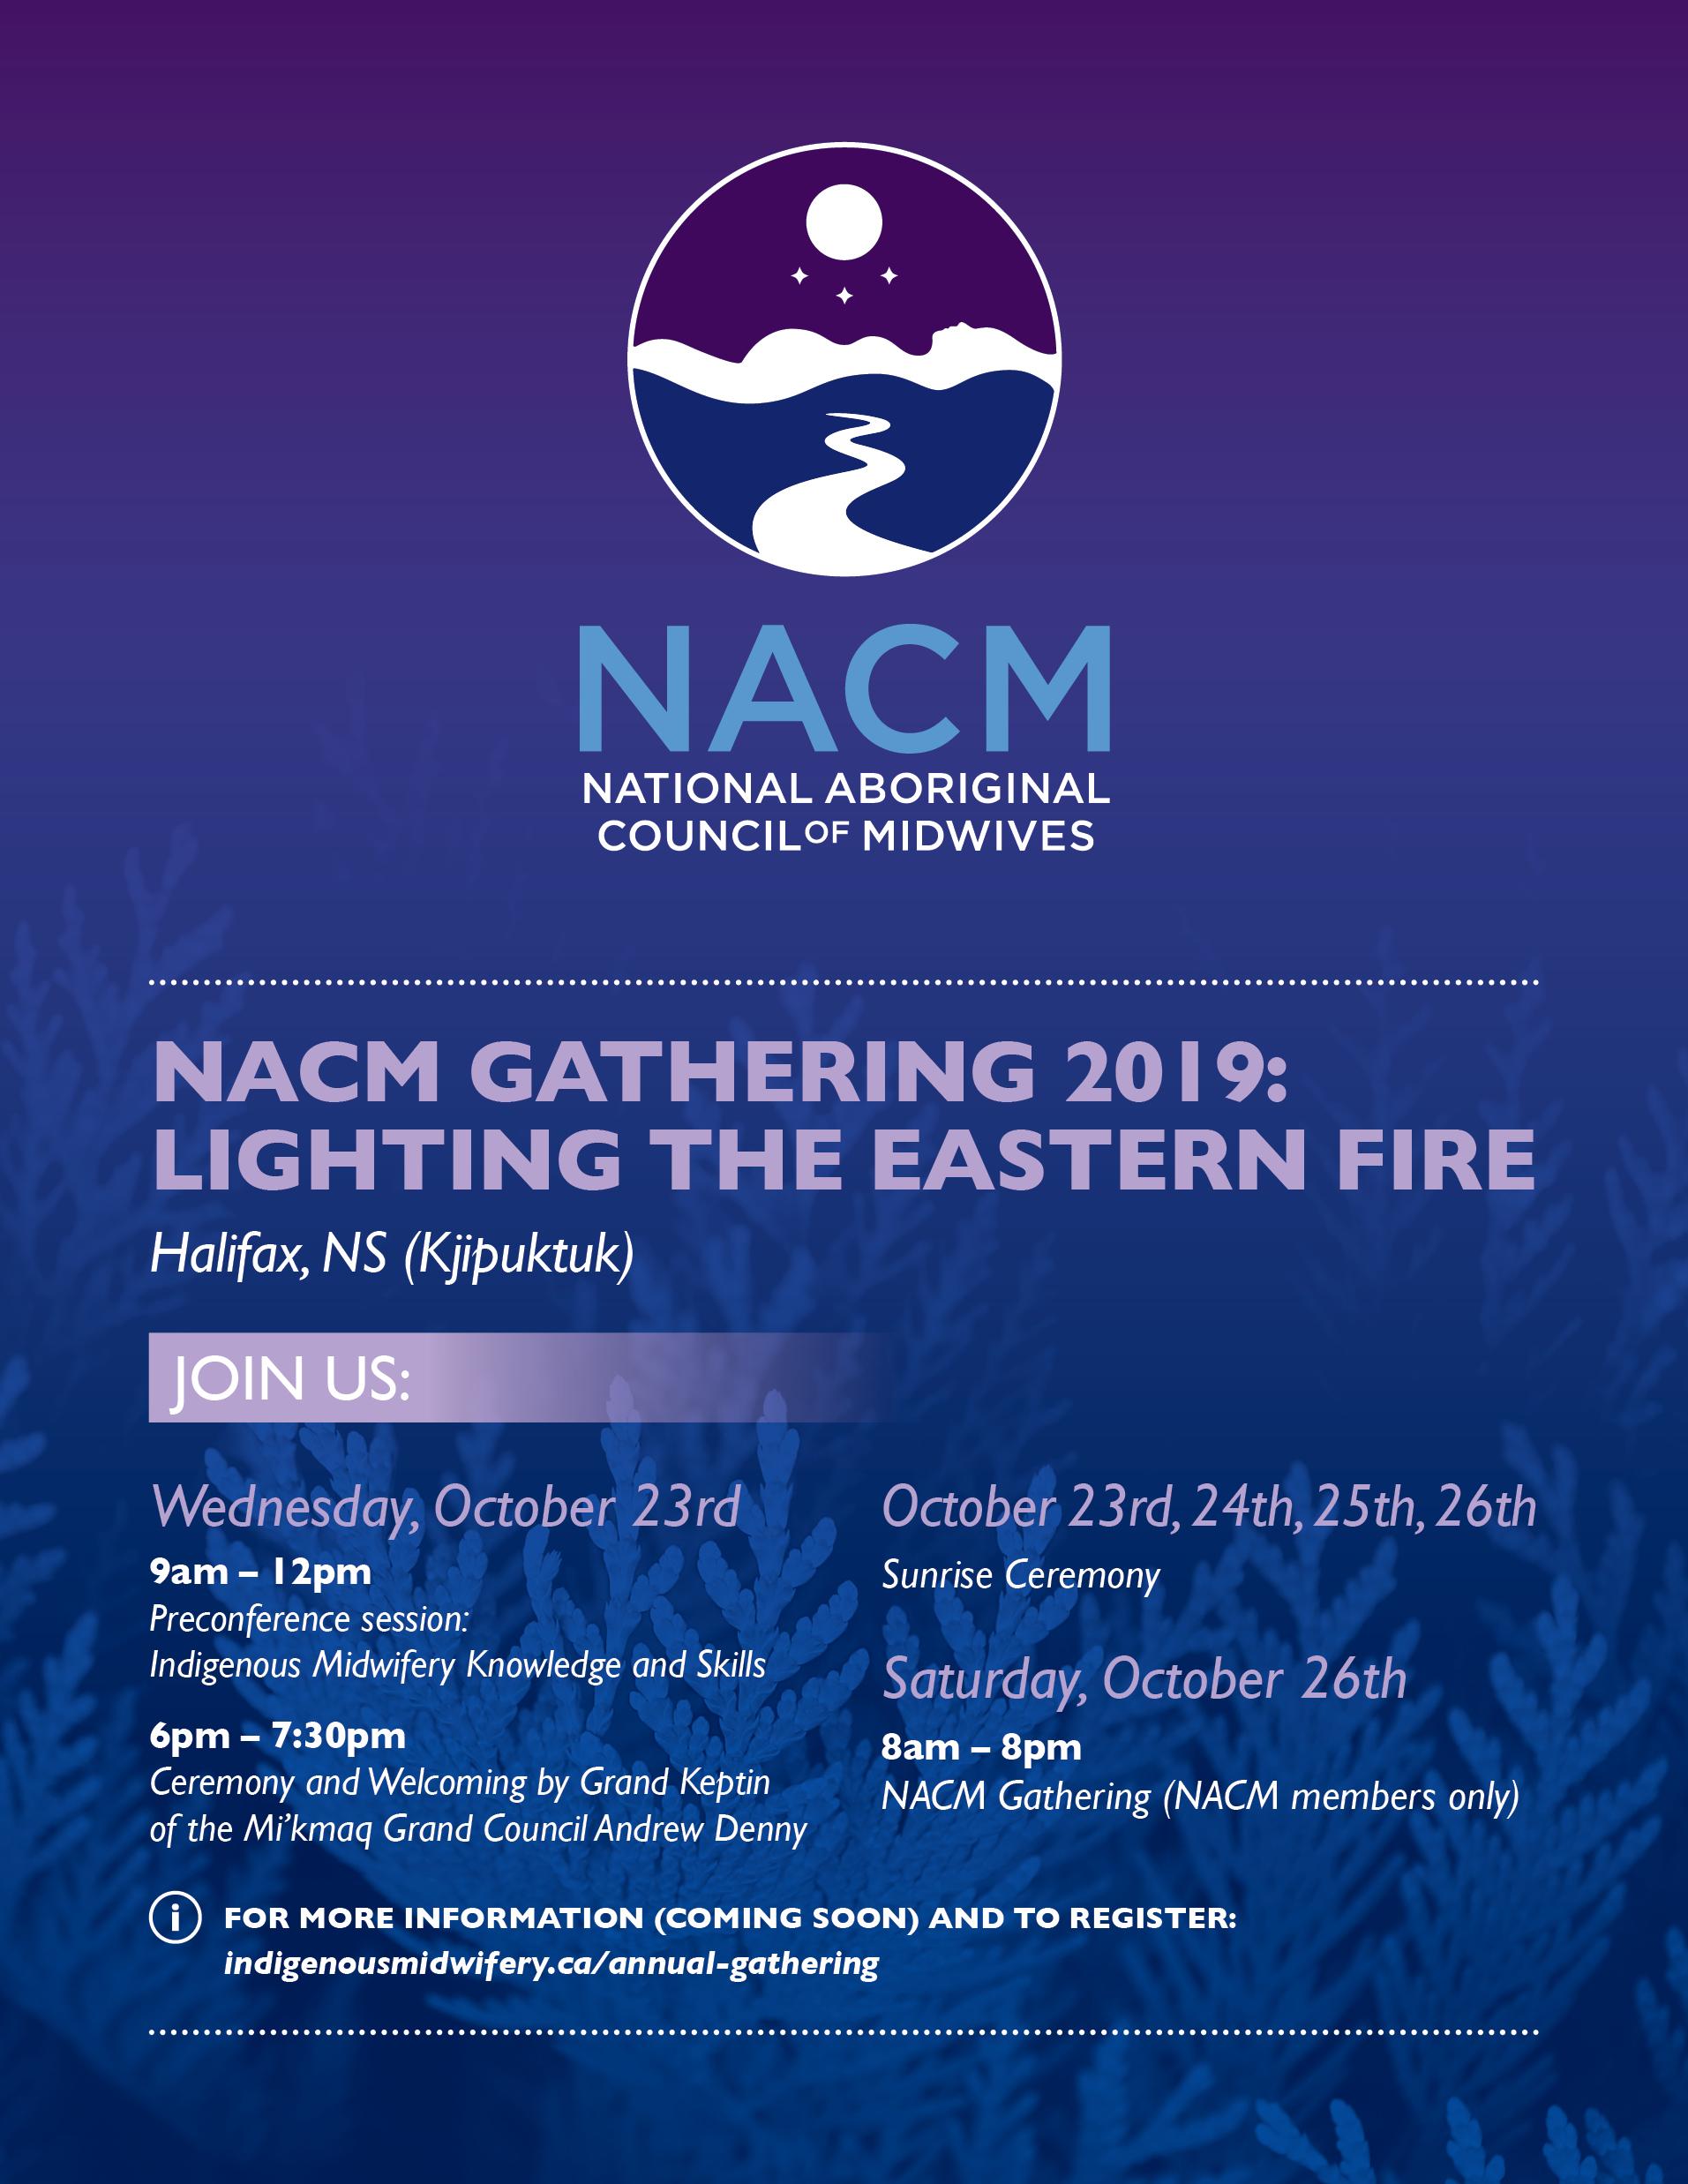 NACM Gathering 2019 Promo Flyer